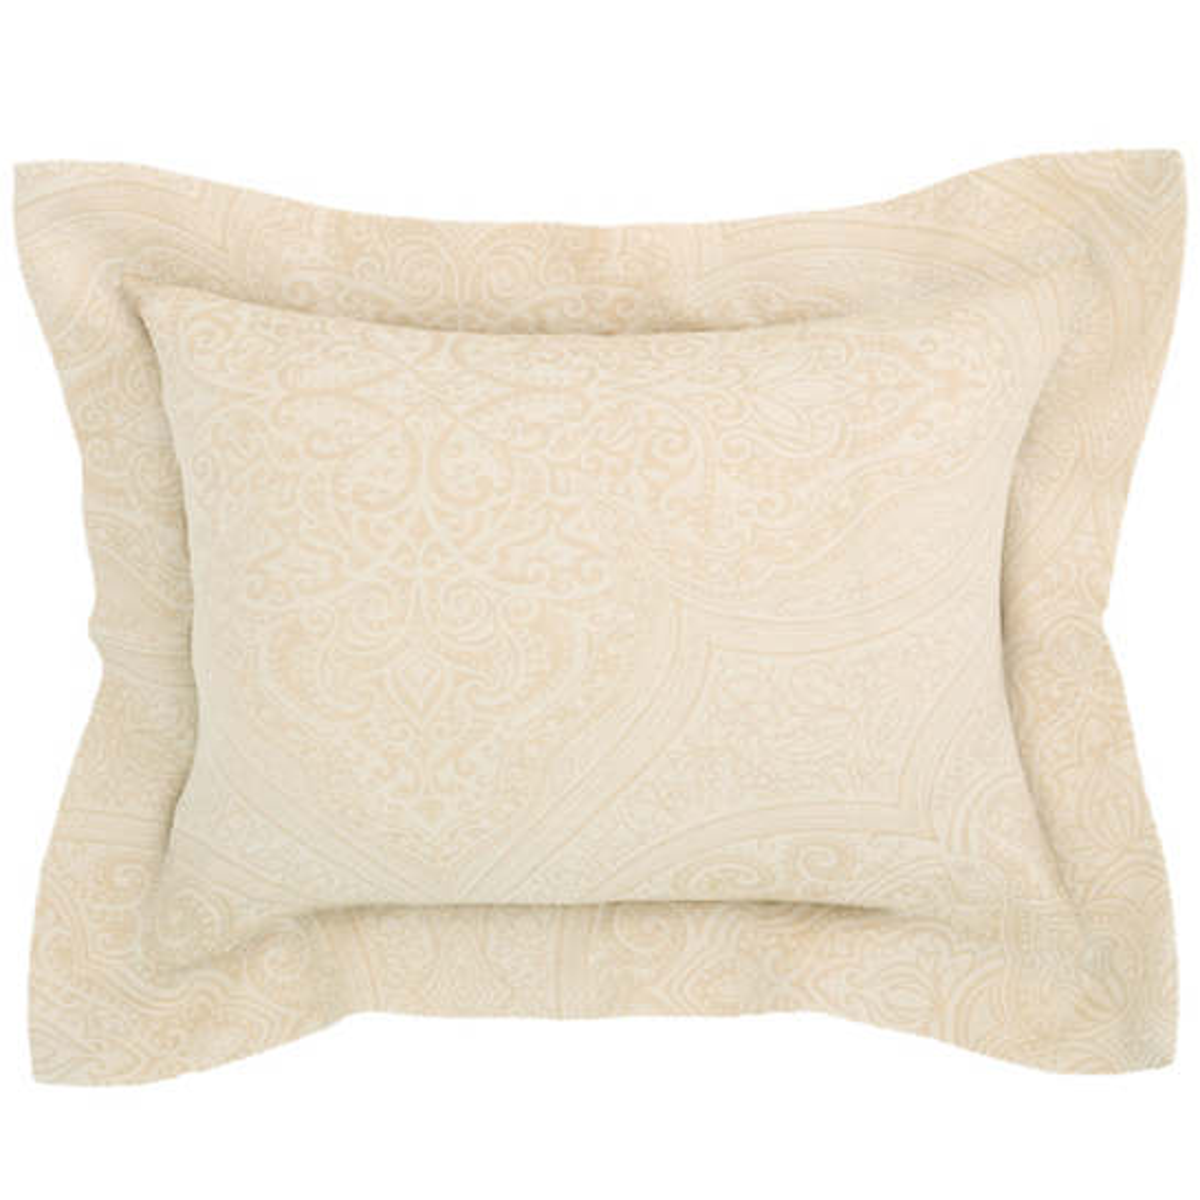 Firenze Semolina Decorative Pillow